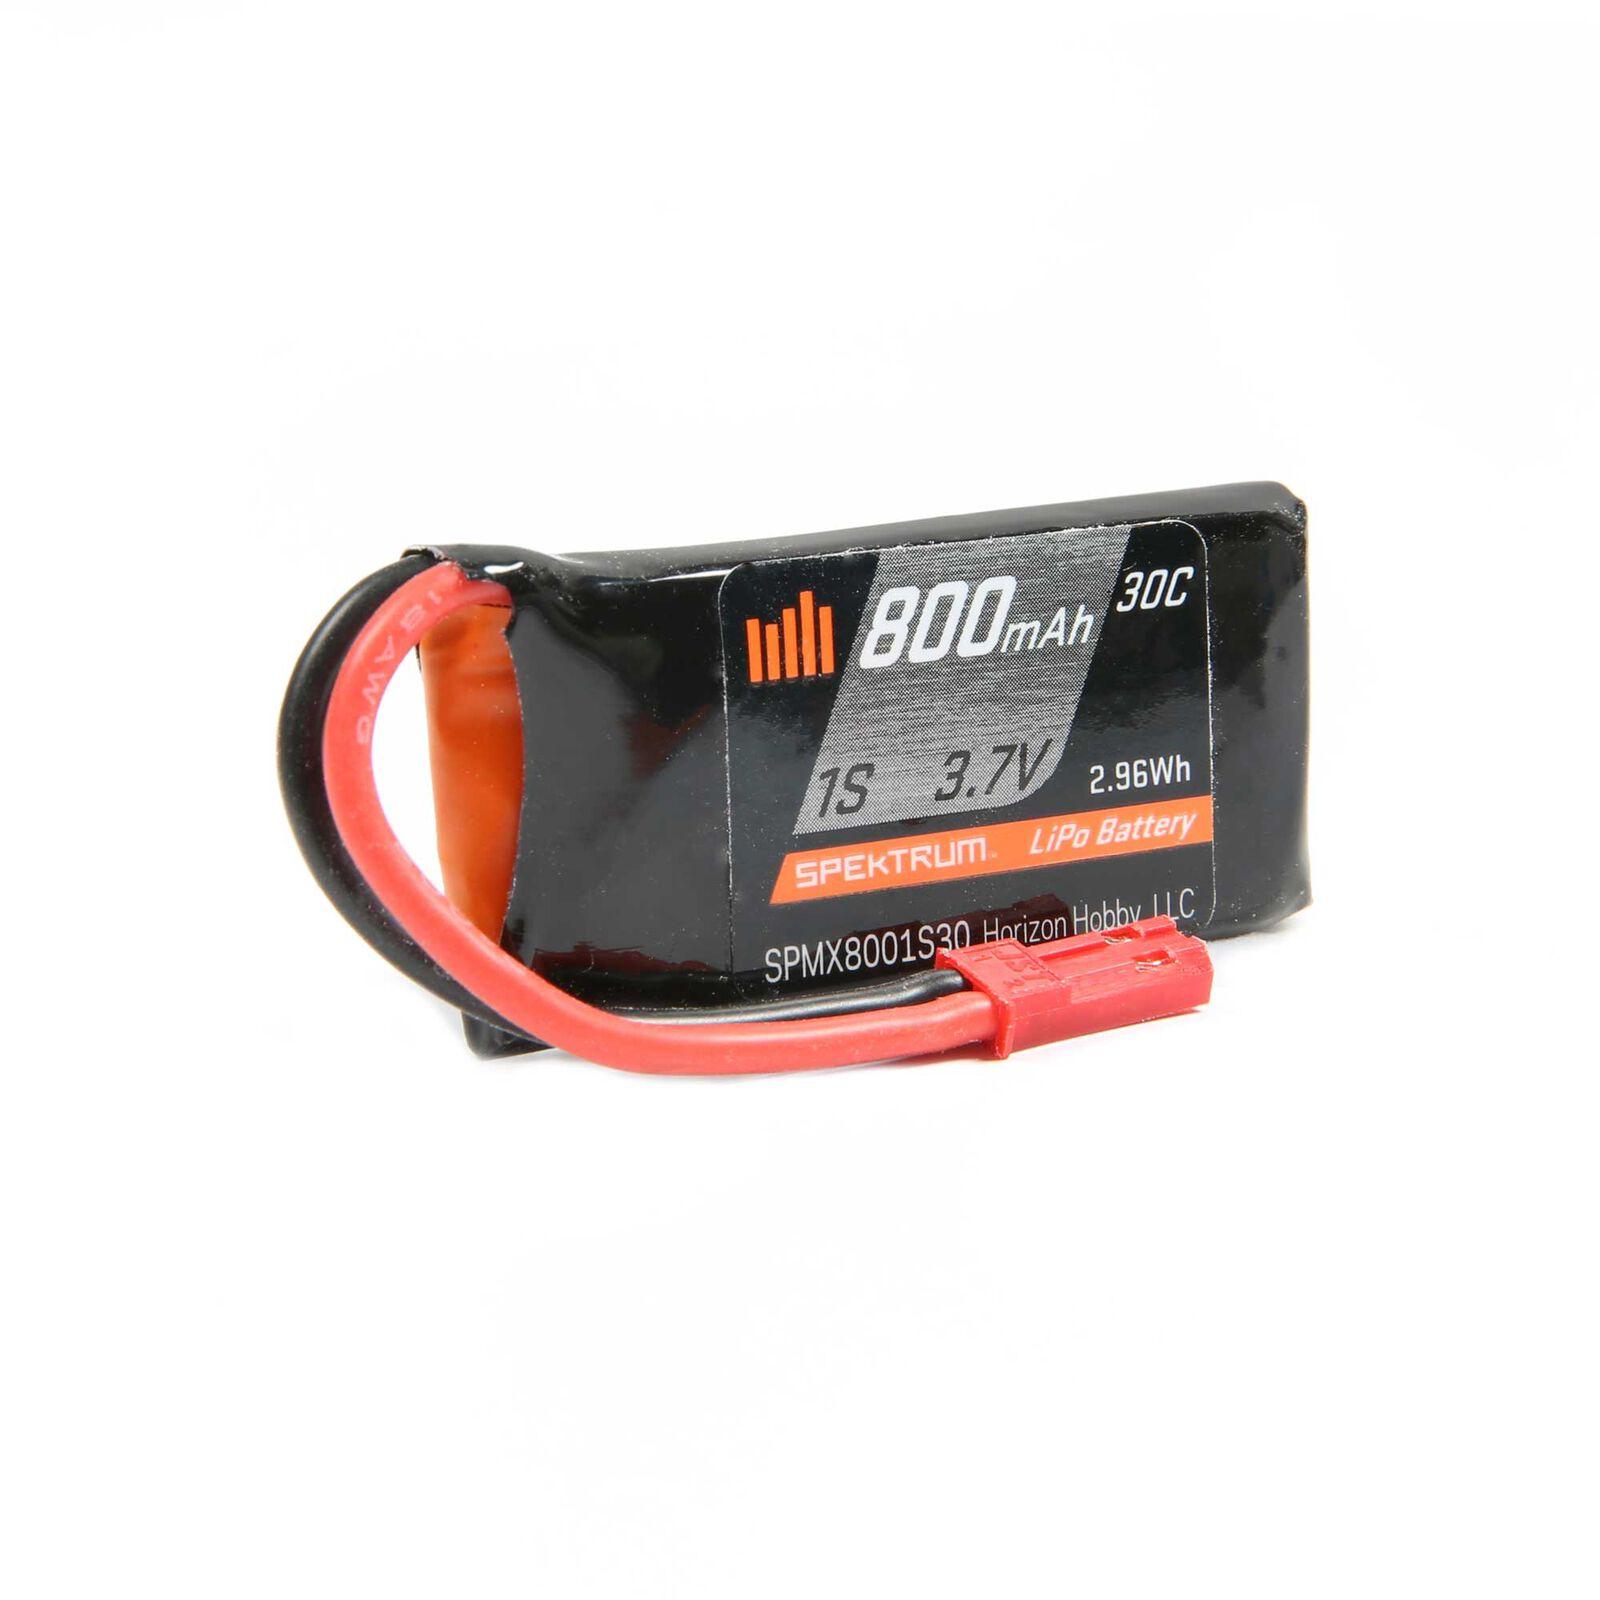 3.7V 800mAh 1S 30C LiPo Battery: JST